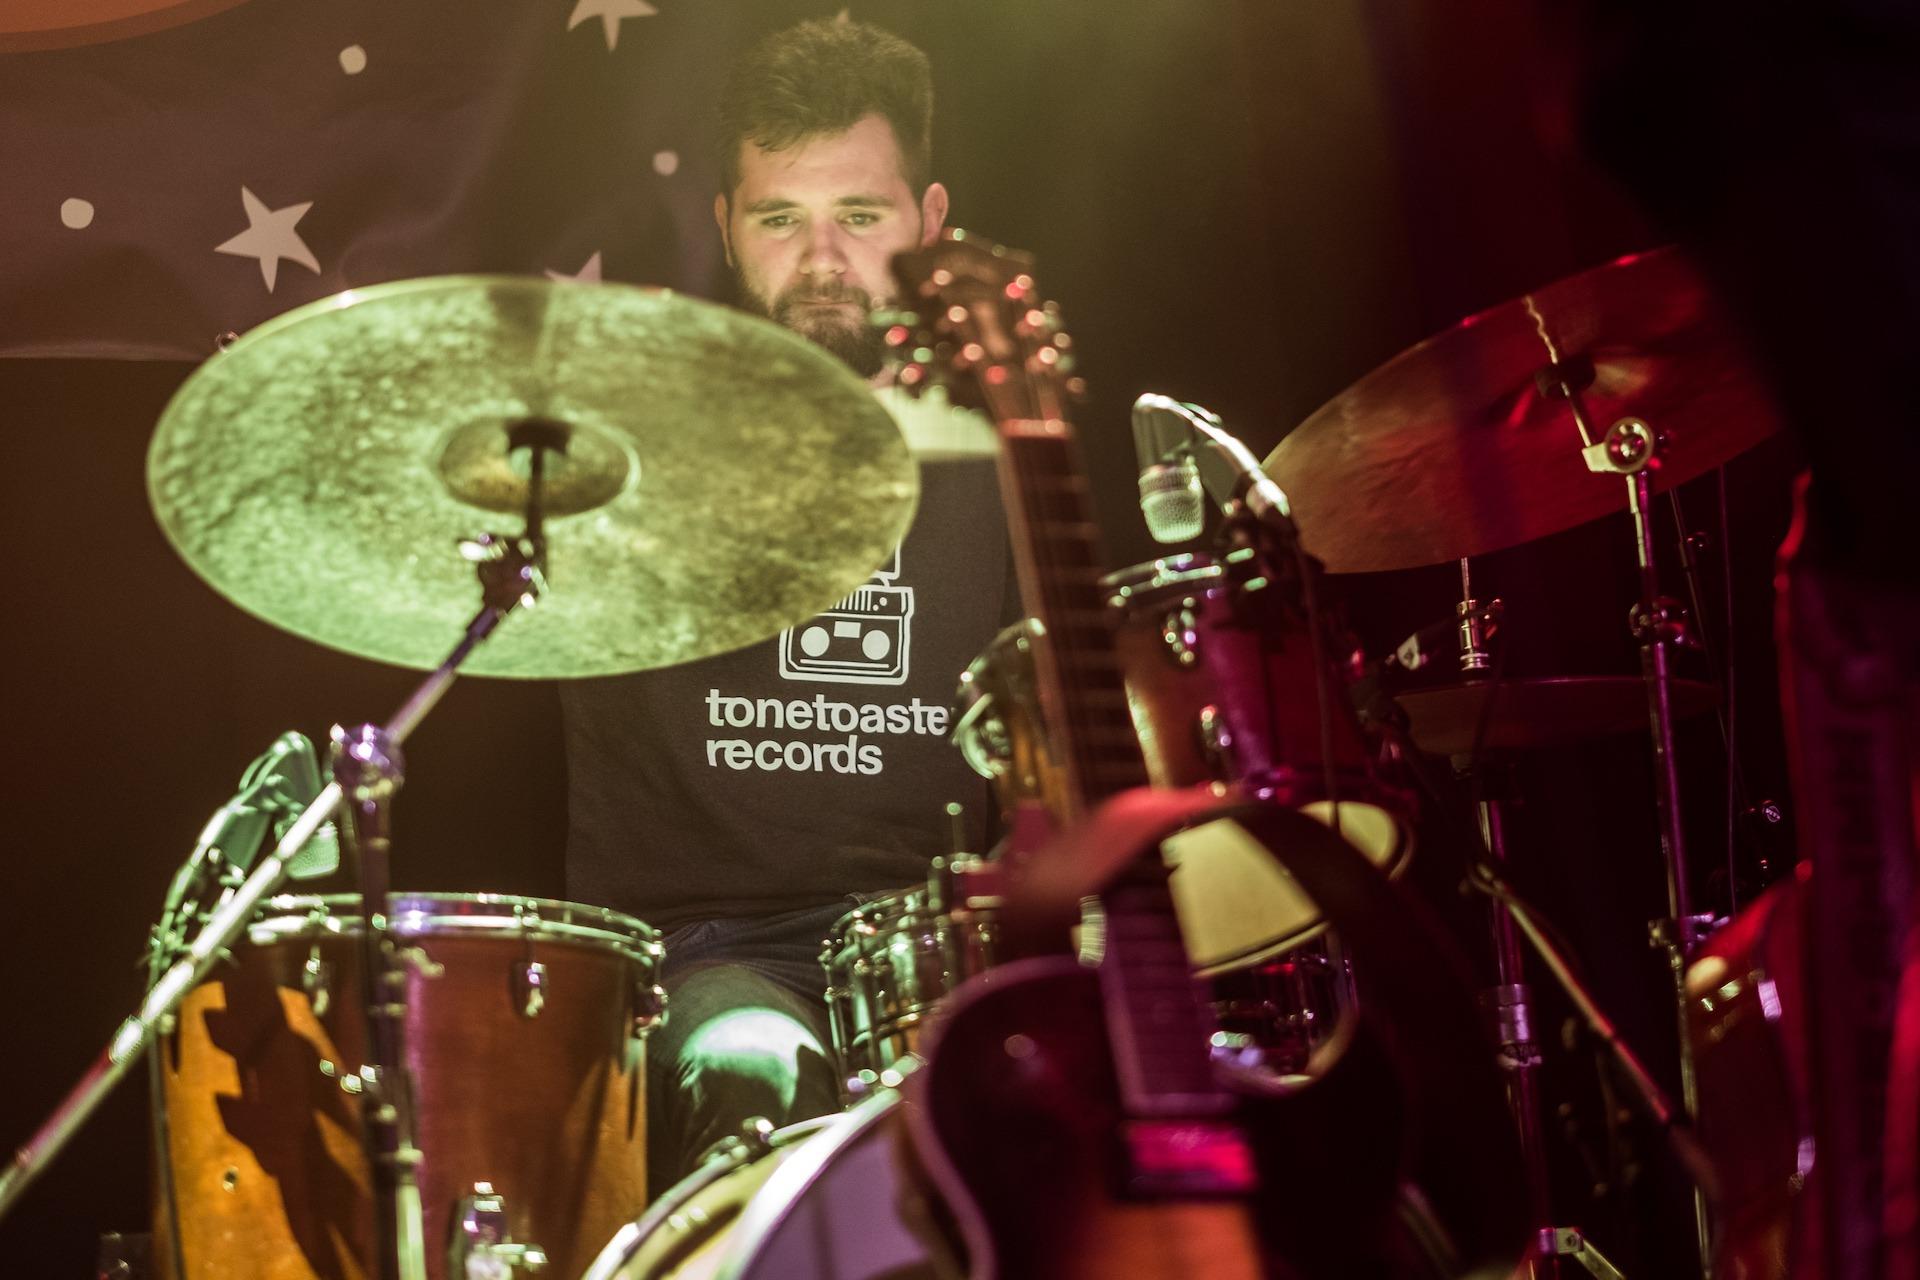 Cian O Sullivan, drums, tonetoaster records t-shirt, Static Roots Festival